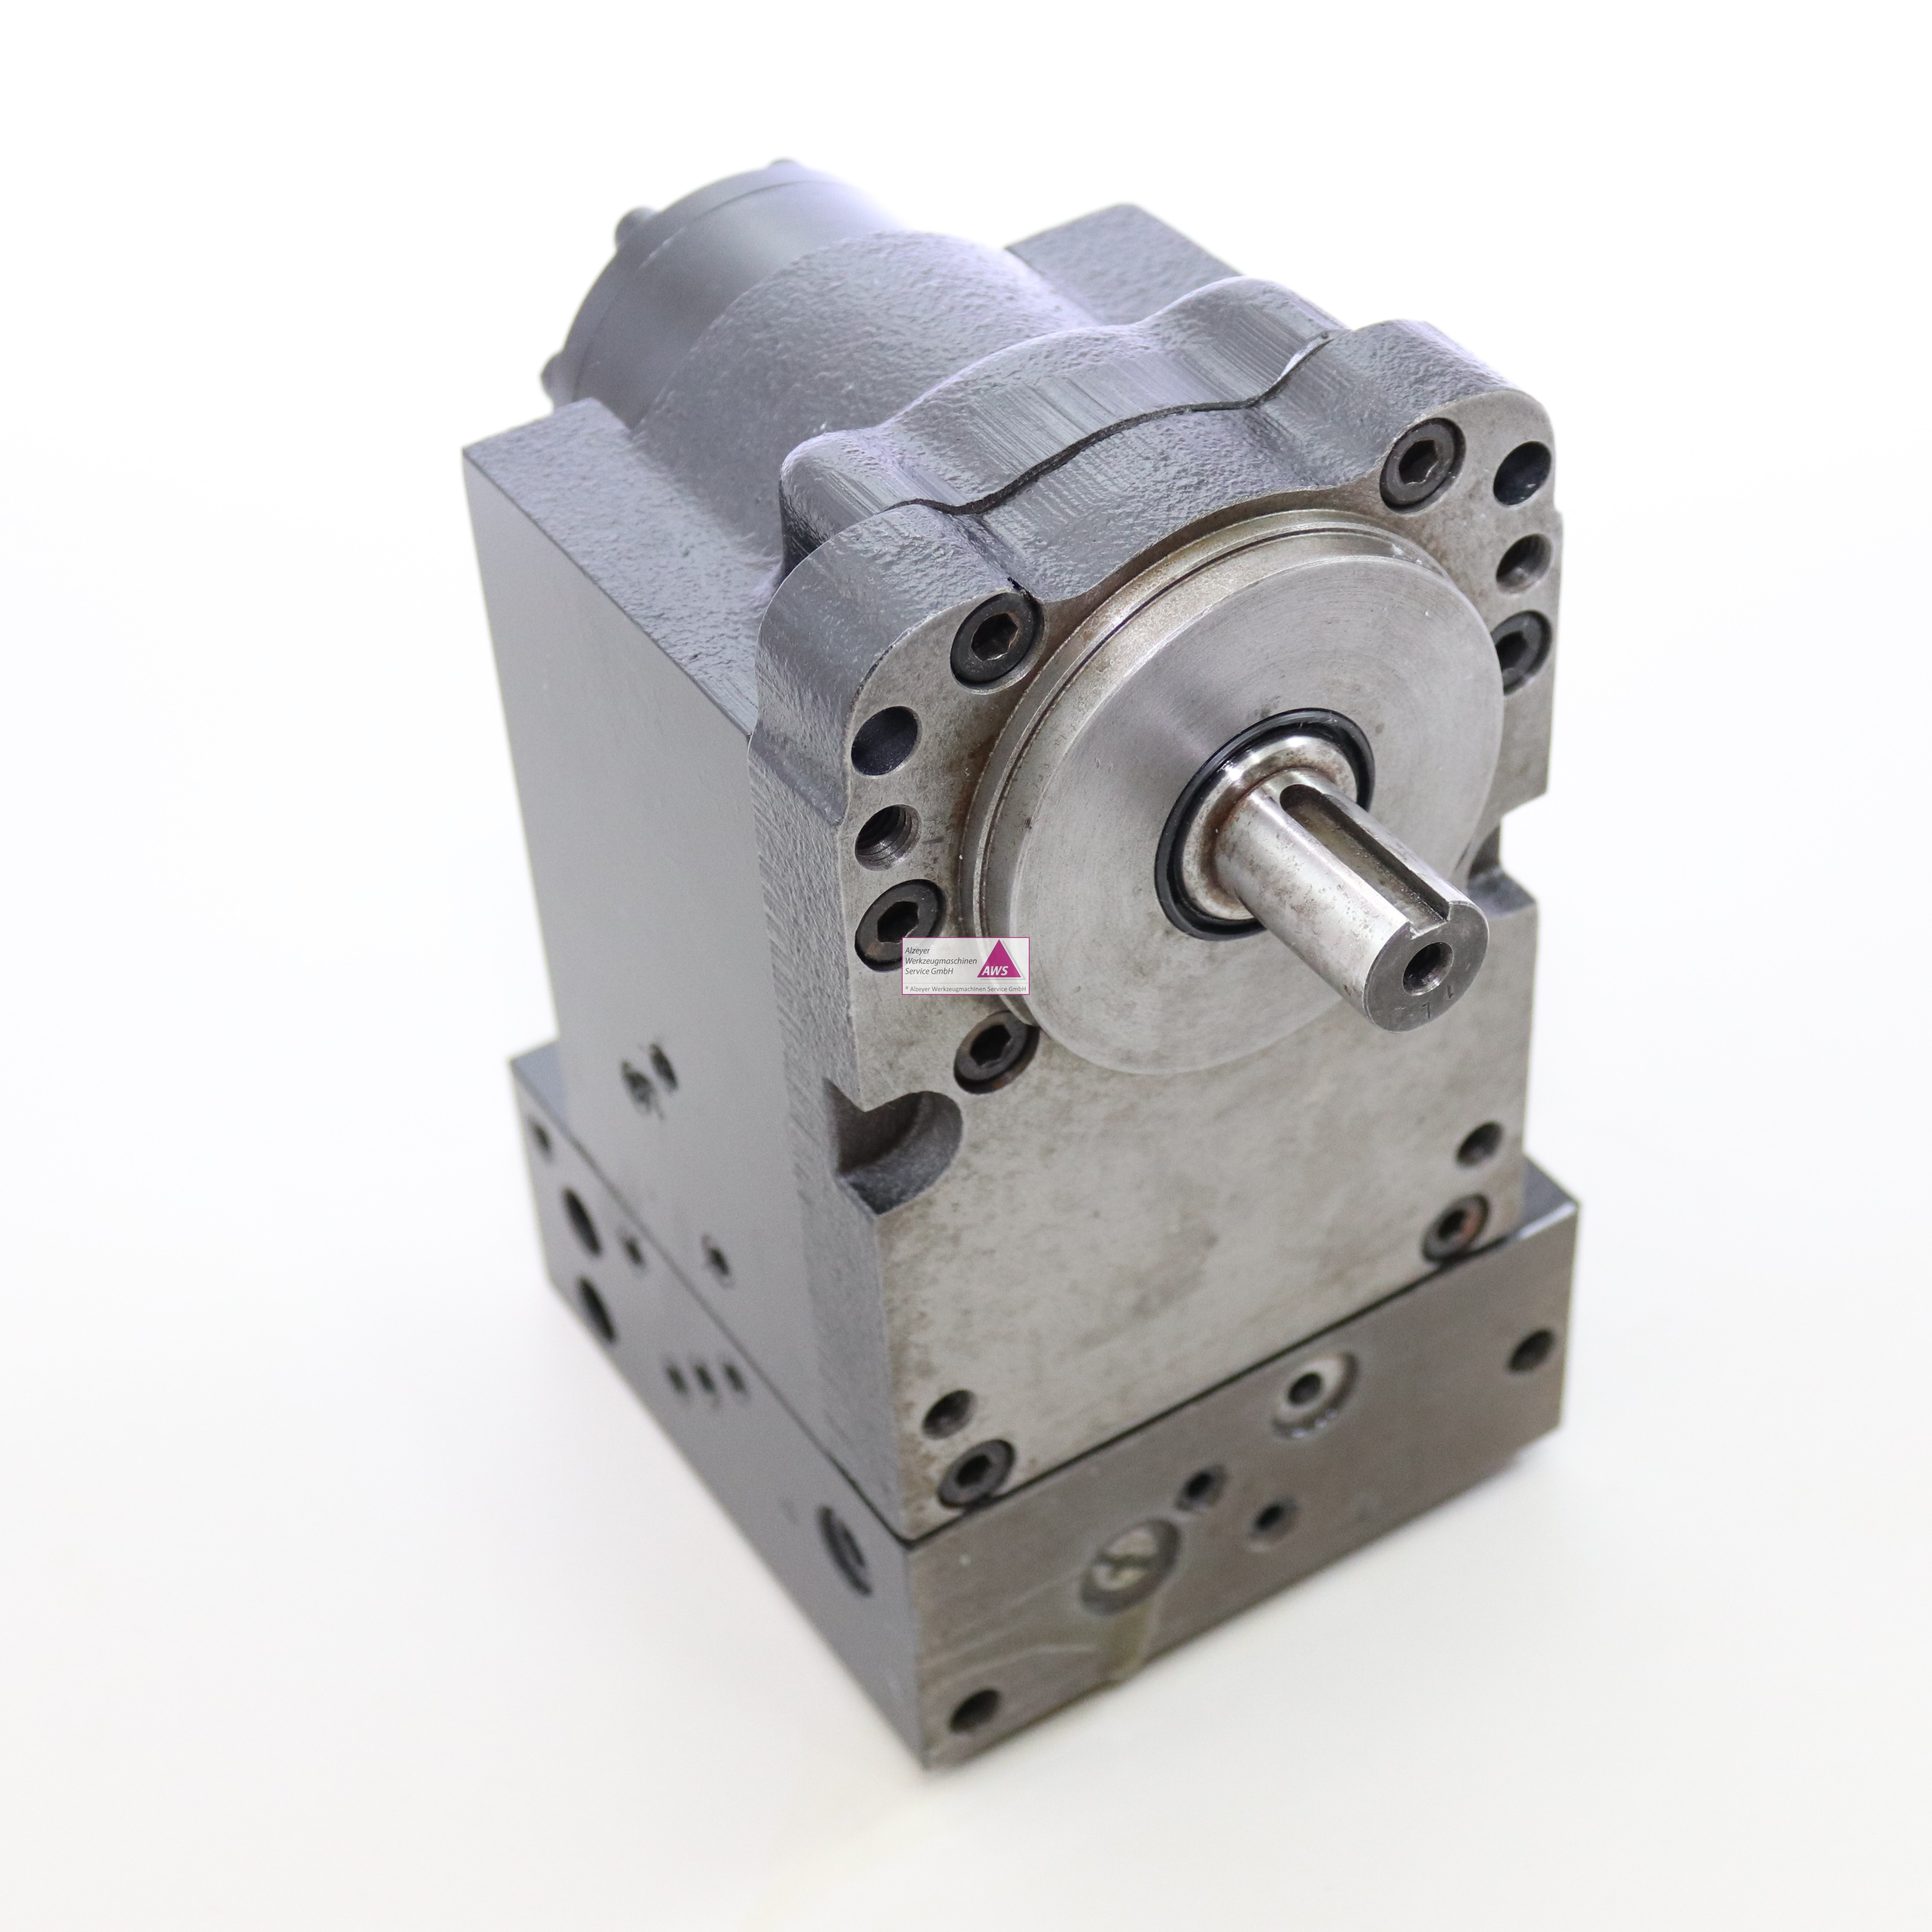 Indexmotor MI-050-1AMO-LO-US für Mazak